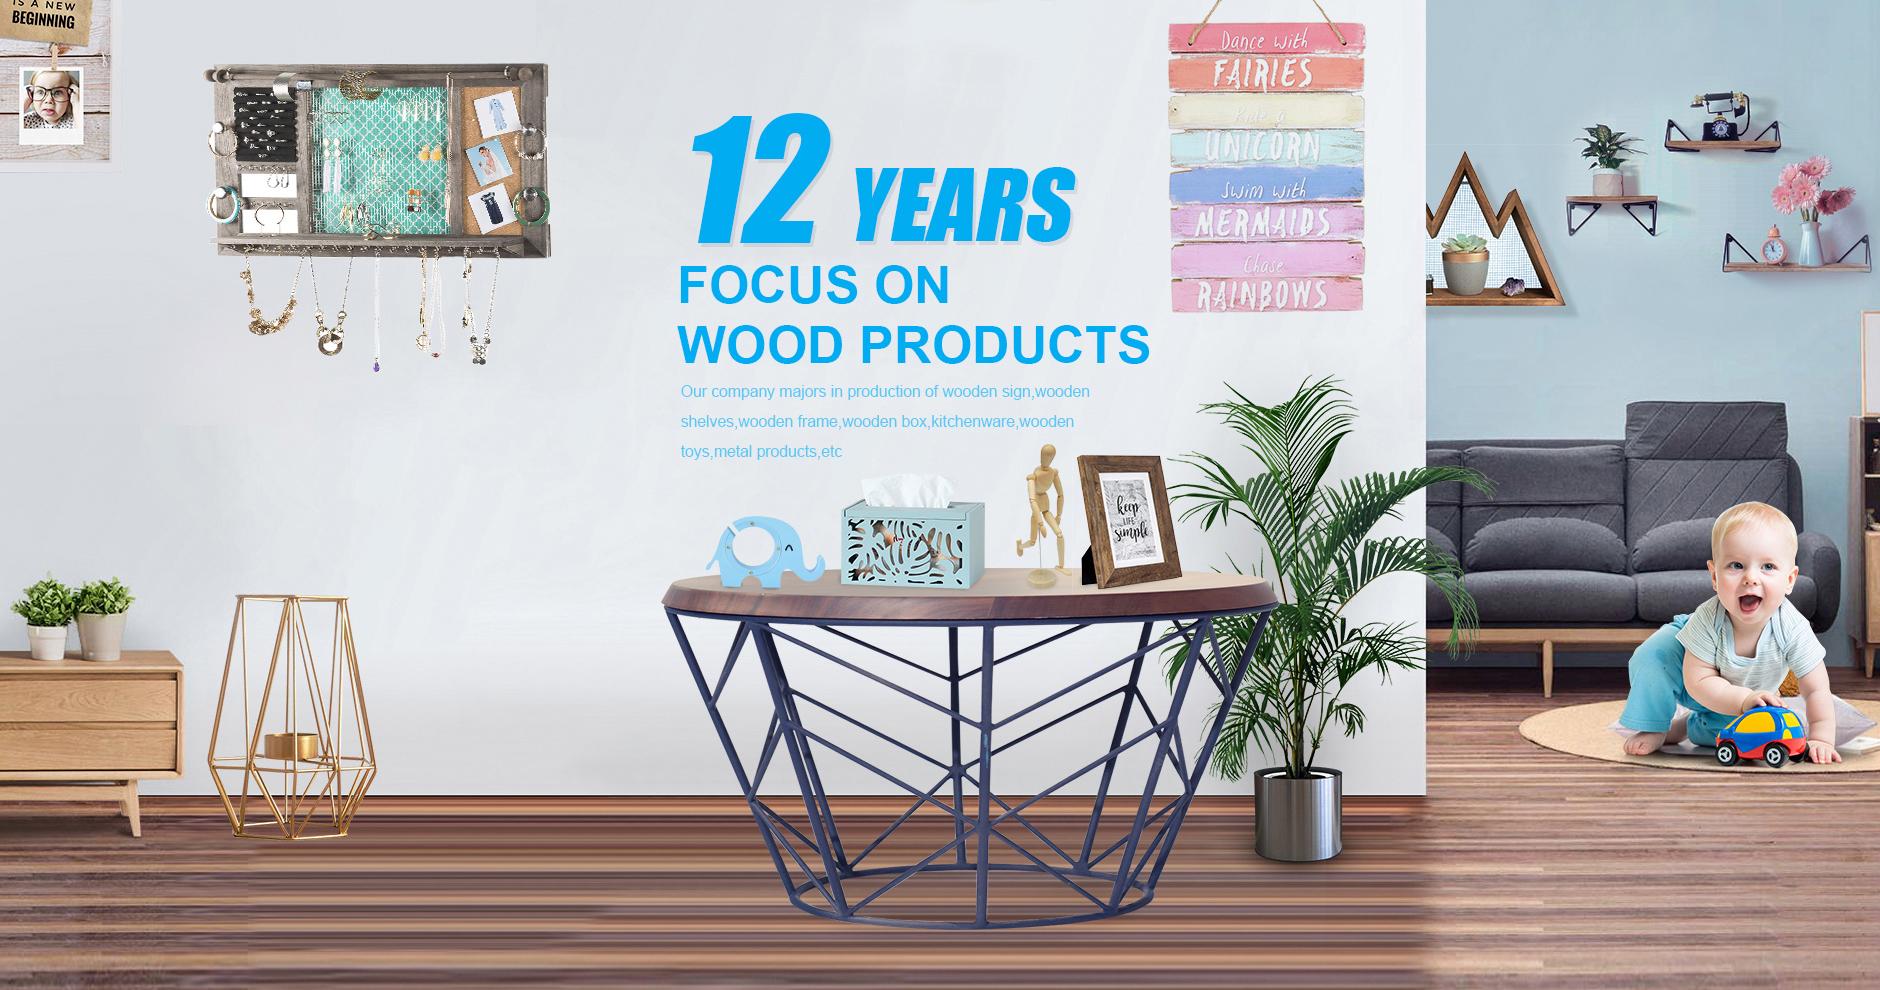 adjustable metal wall shelf kmart.htm best goal  shanghai  manufacture co   ltd wooden craft  metal  manufacture co   ltd wooden craft